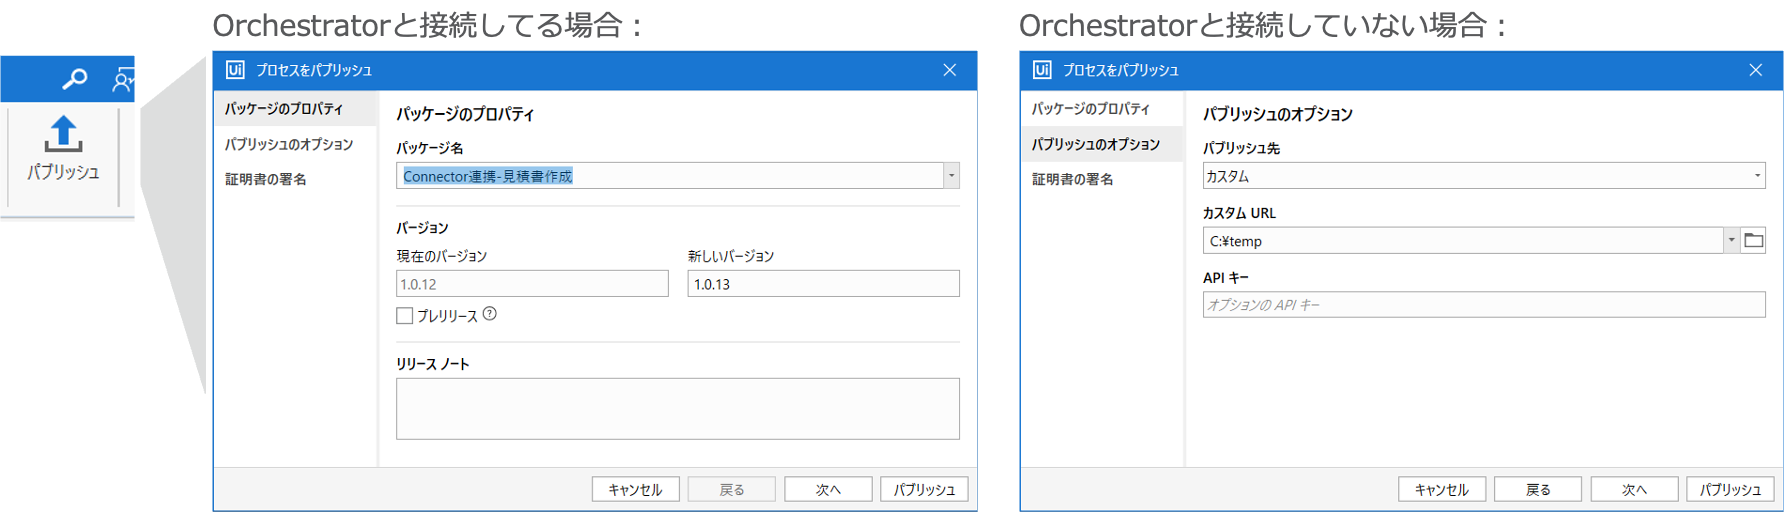 Orchestratorと接続してる場合、Orchestratorと接続していない場合